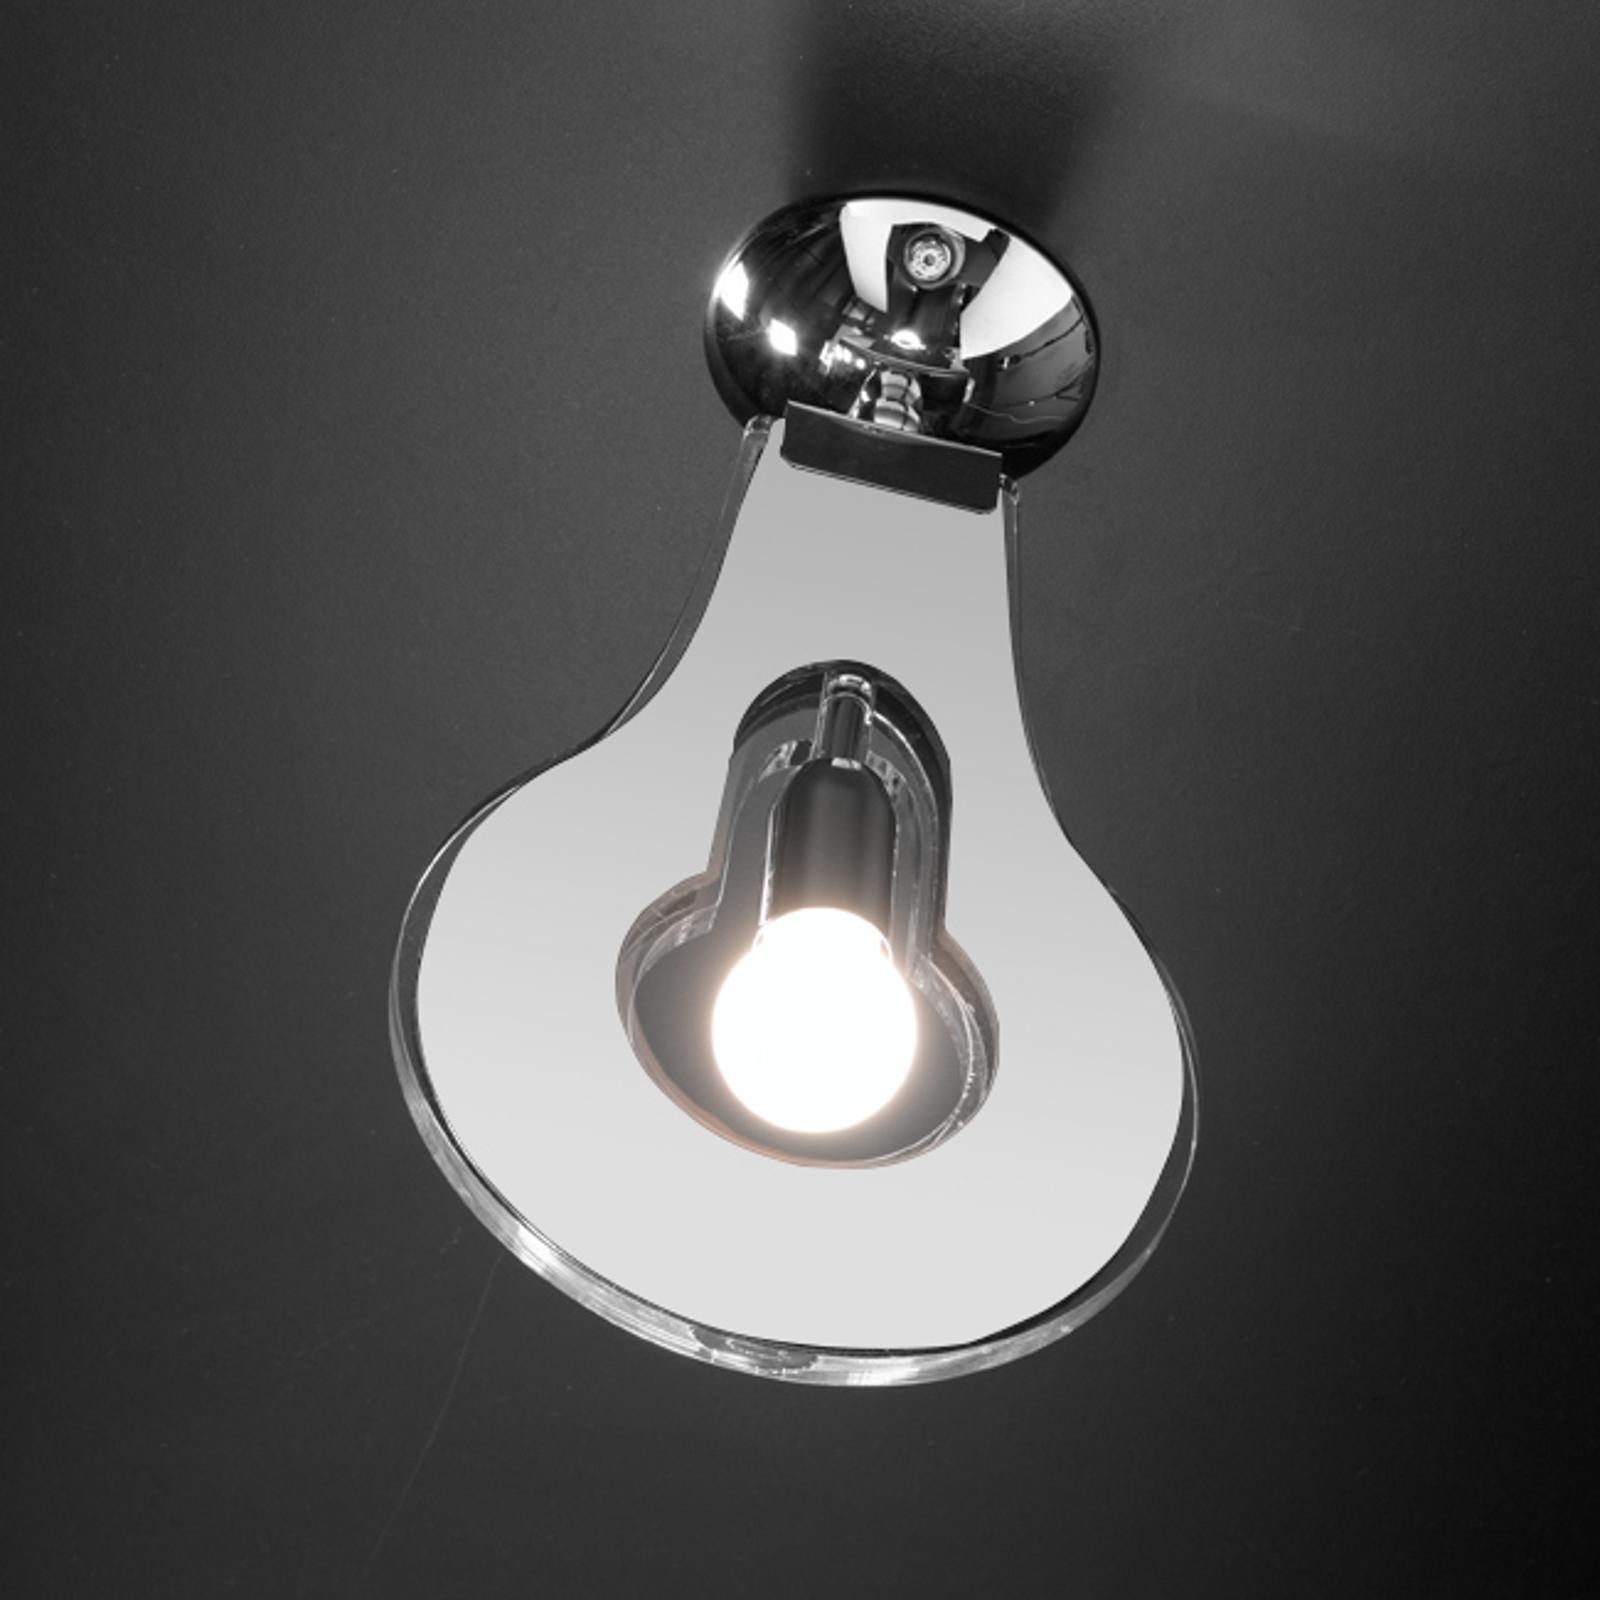 Oryginalna lampa sufitowa Flat biała